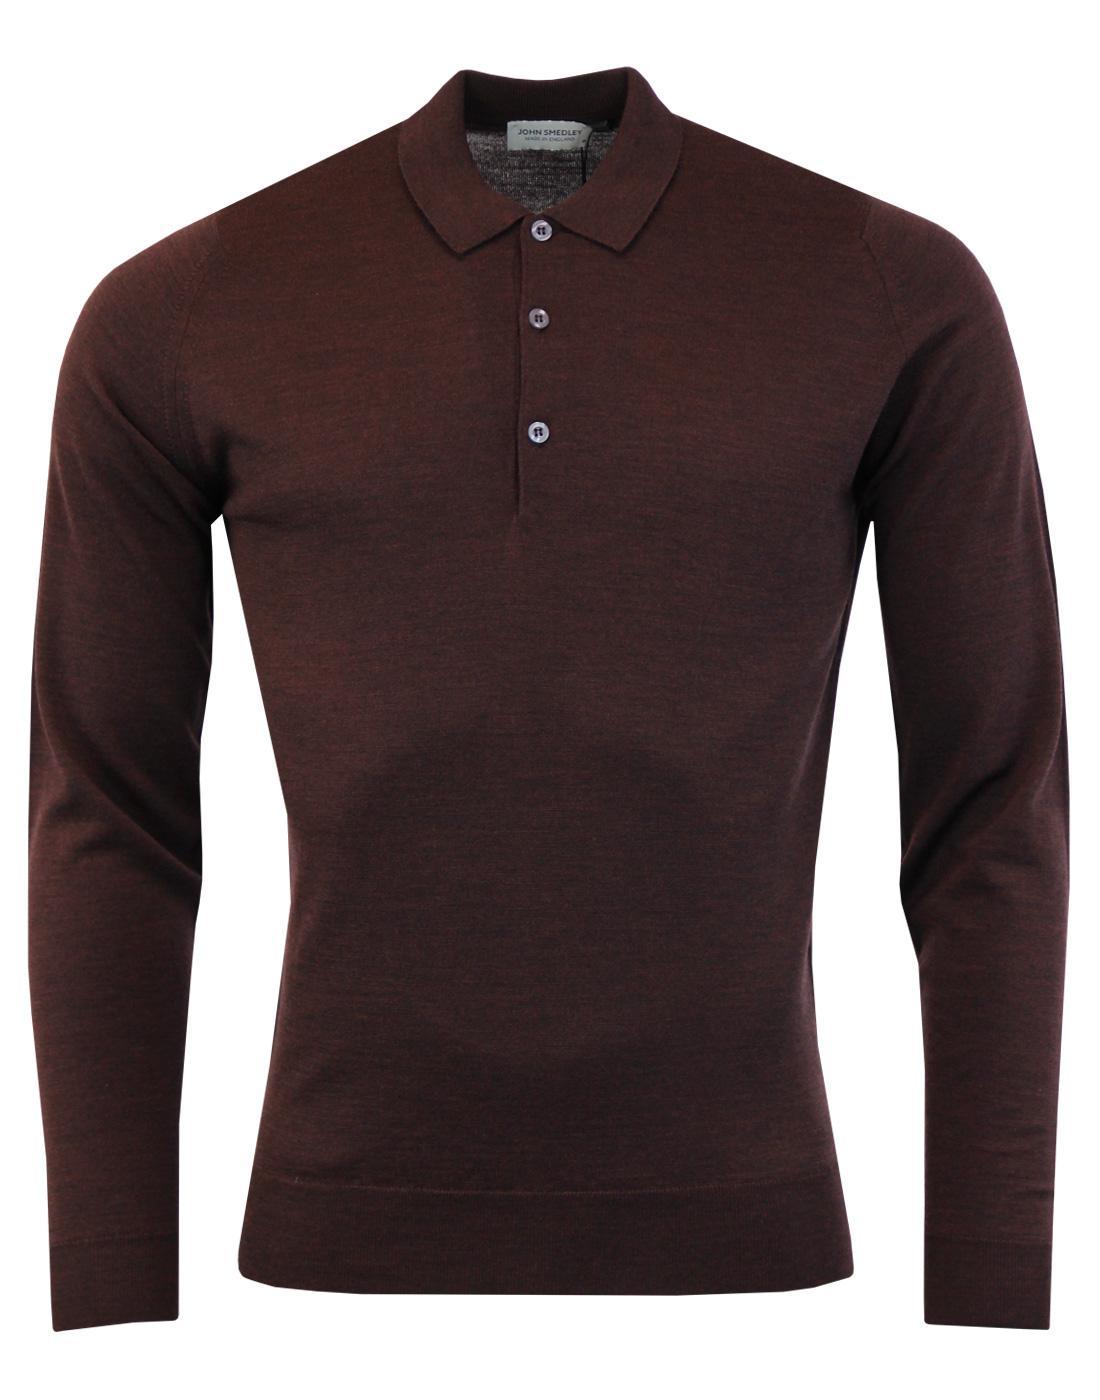 Belper JOHN SMEDLEY Men's 60s Mod Knitted Polo (C)